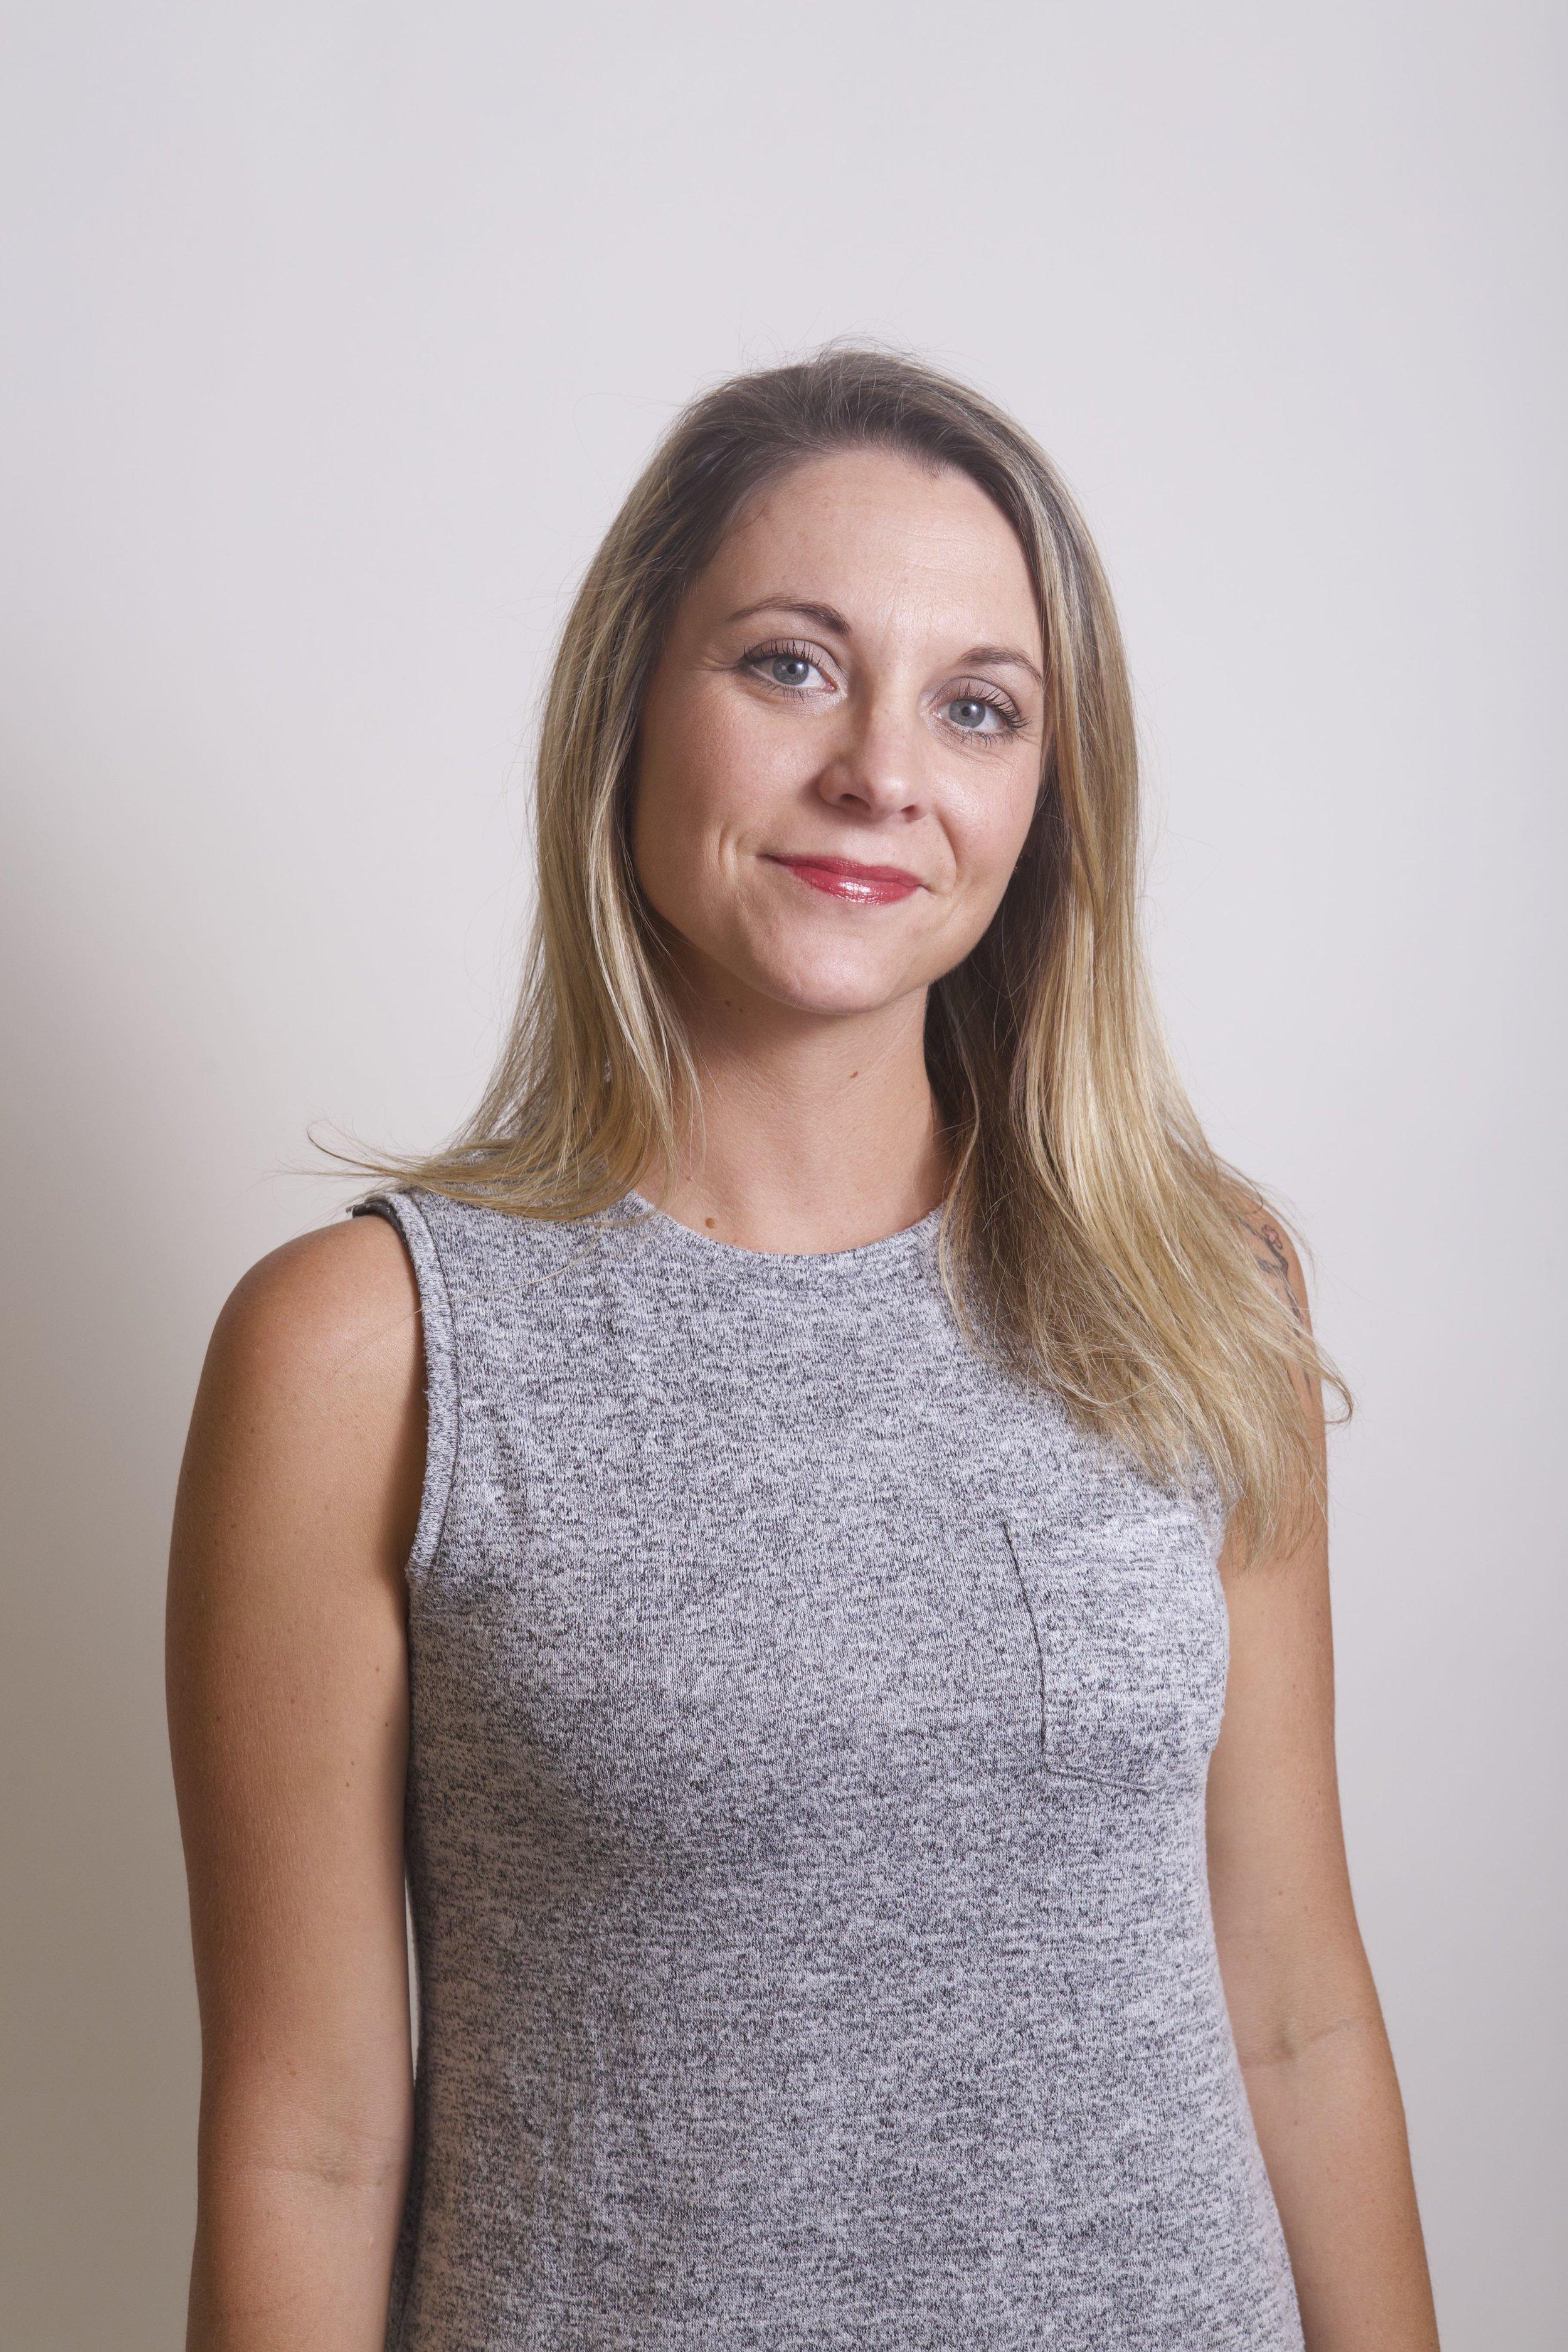 Jessica Burdg